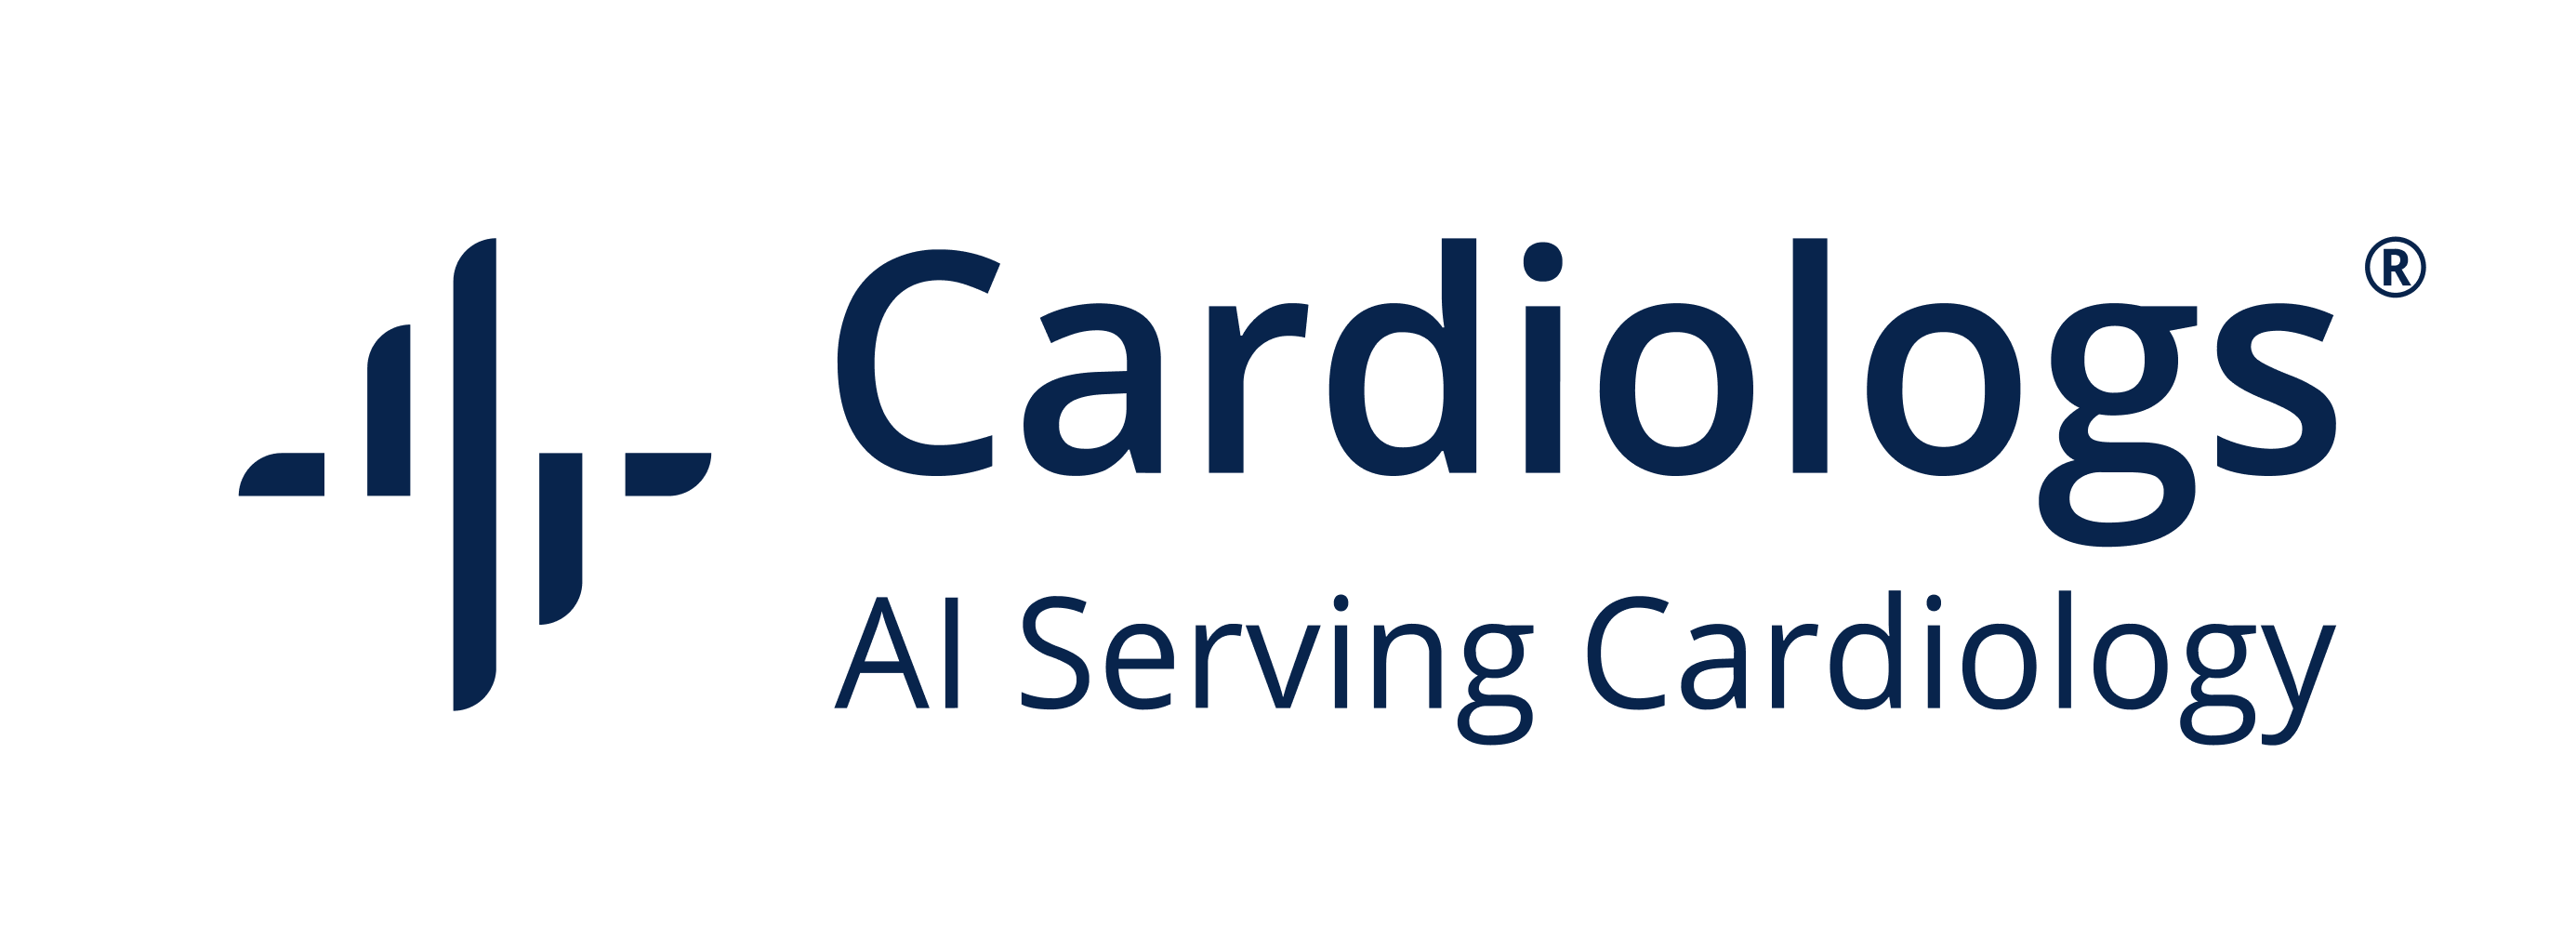 Cardiologs logo